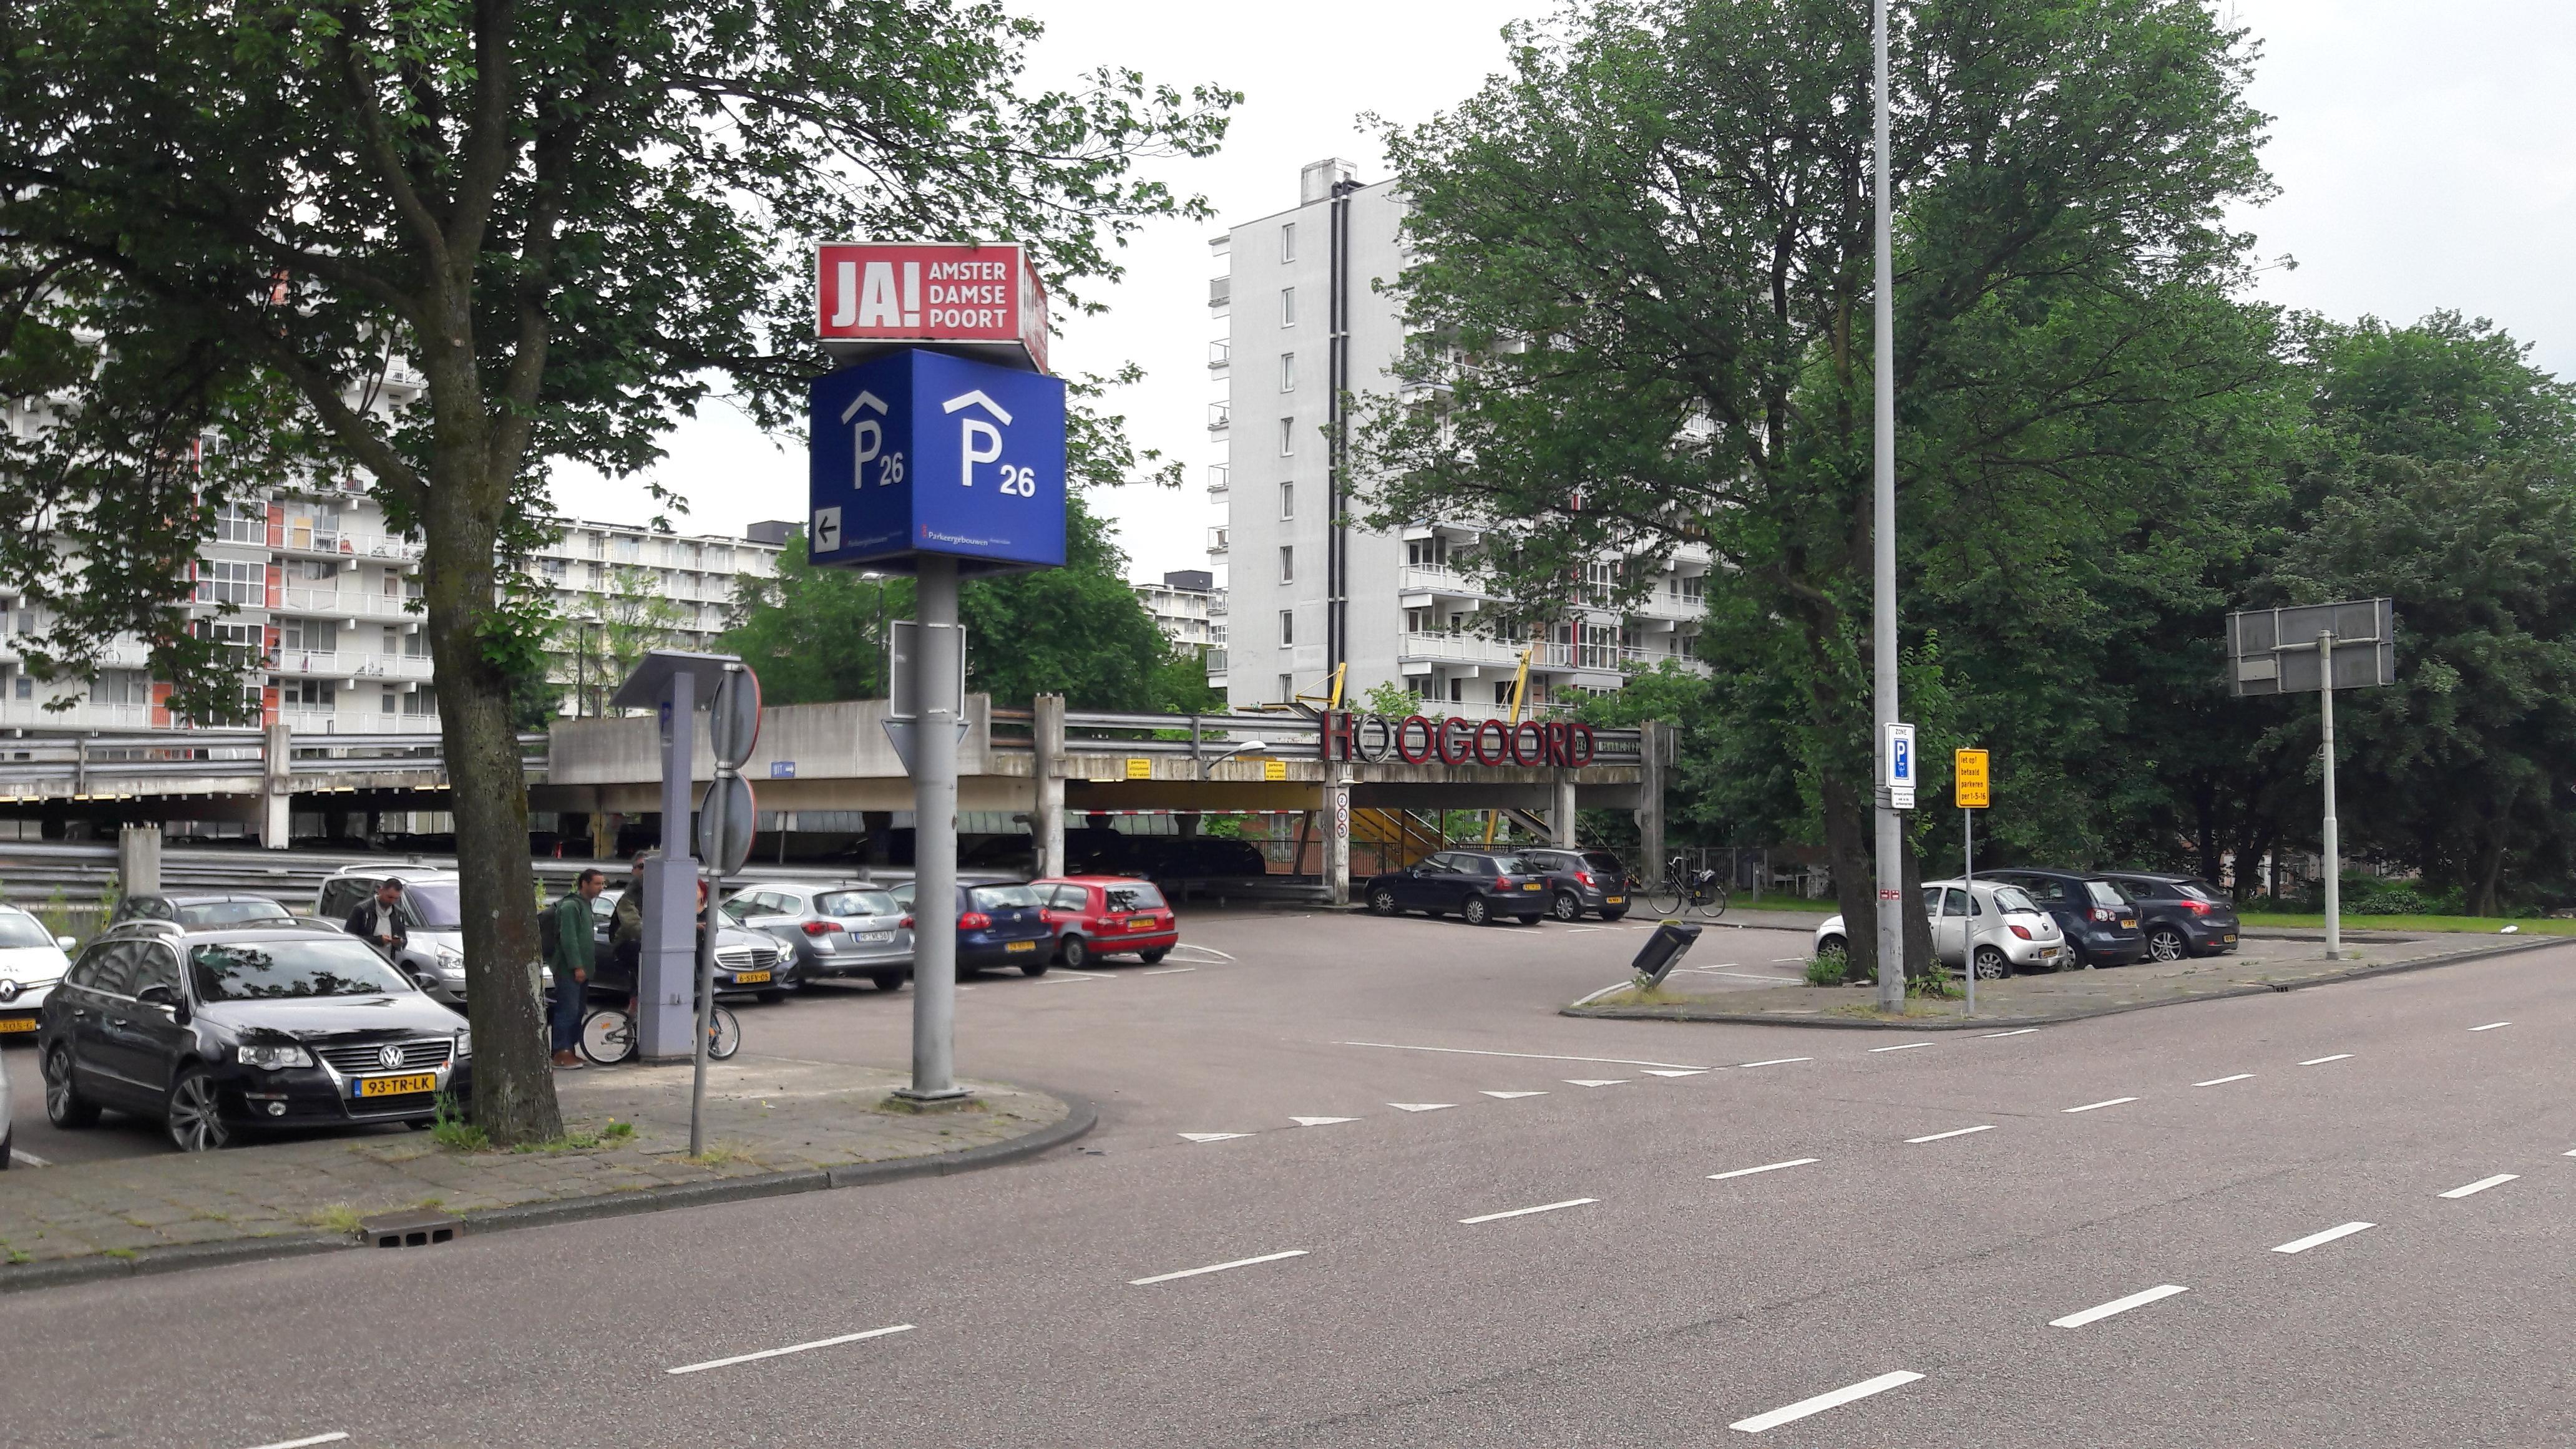 Amsterdamse poort p26 parking in amsterdam zuidoost parkme for Amsterdam poort